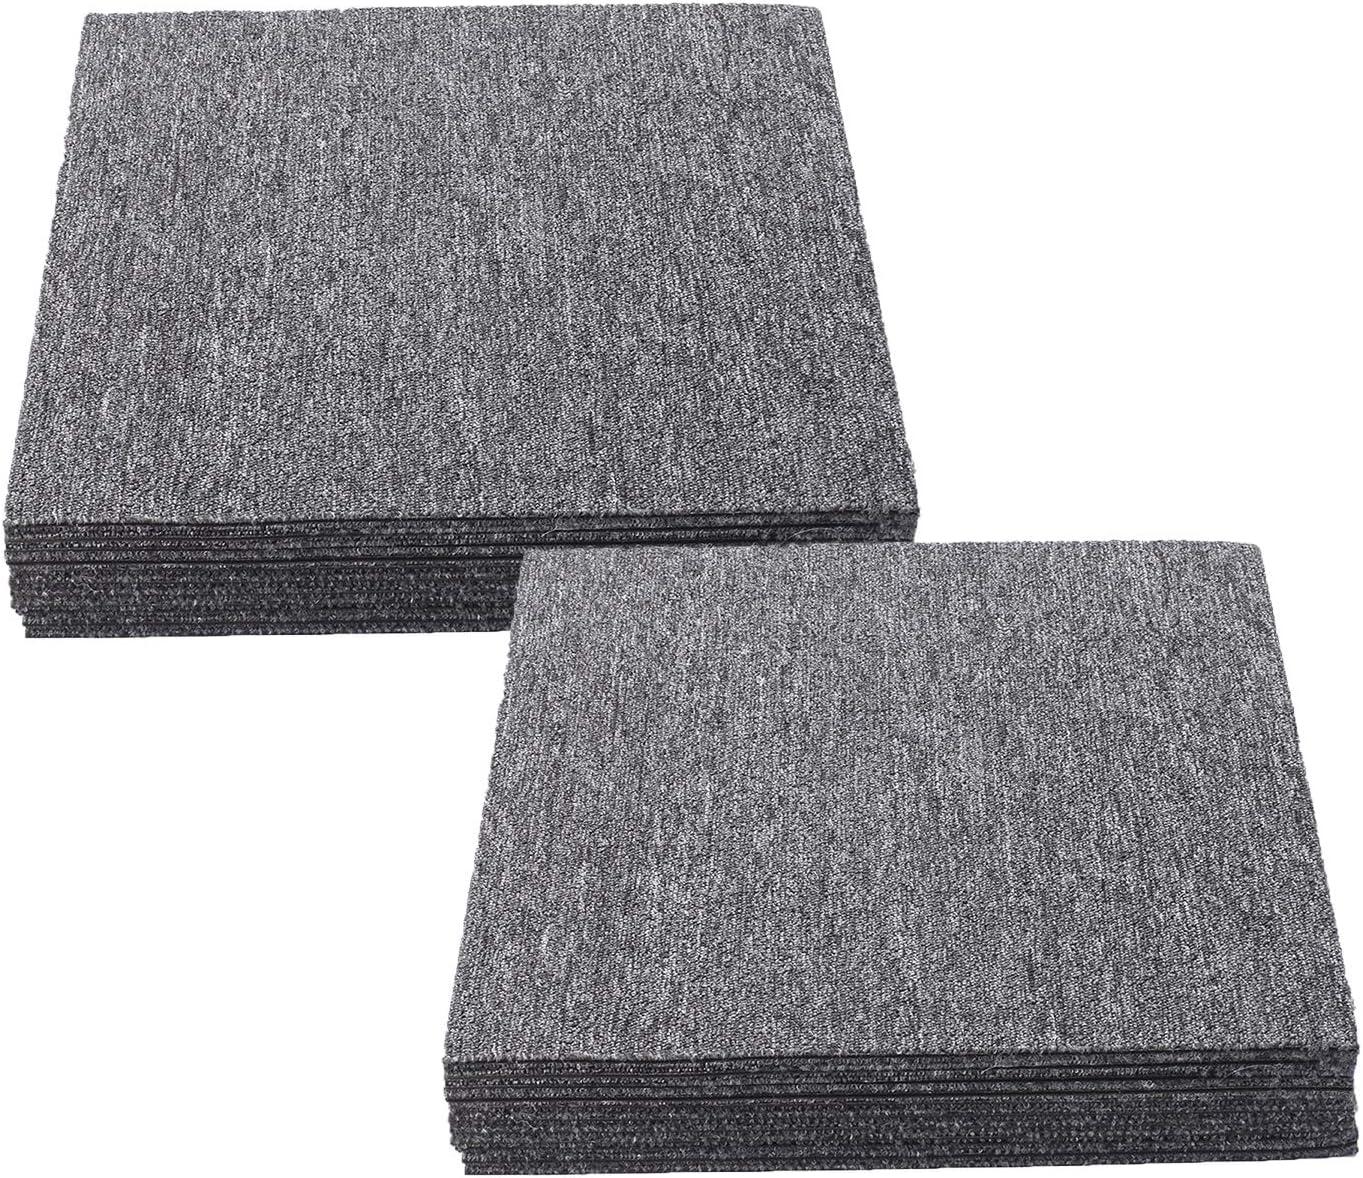 Nisorpa Commercial Carpet Floor Tiles Dark Grey 20x20 inch 20pcs Pack Washable Carpet Floor Tiles Heavy Duty Carpet Squares Bitumen Backed for Indoor Home Office Apply